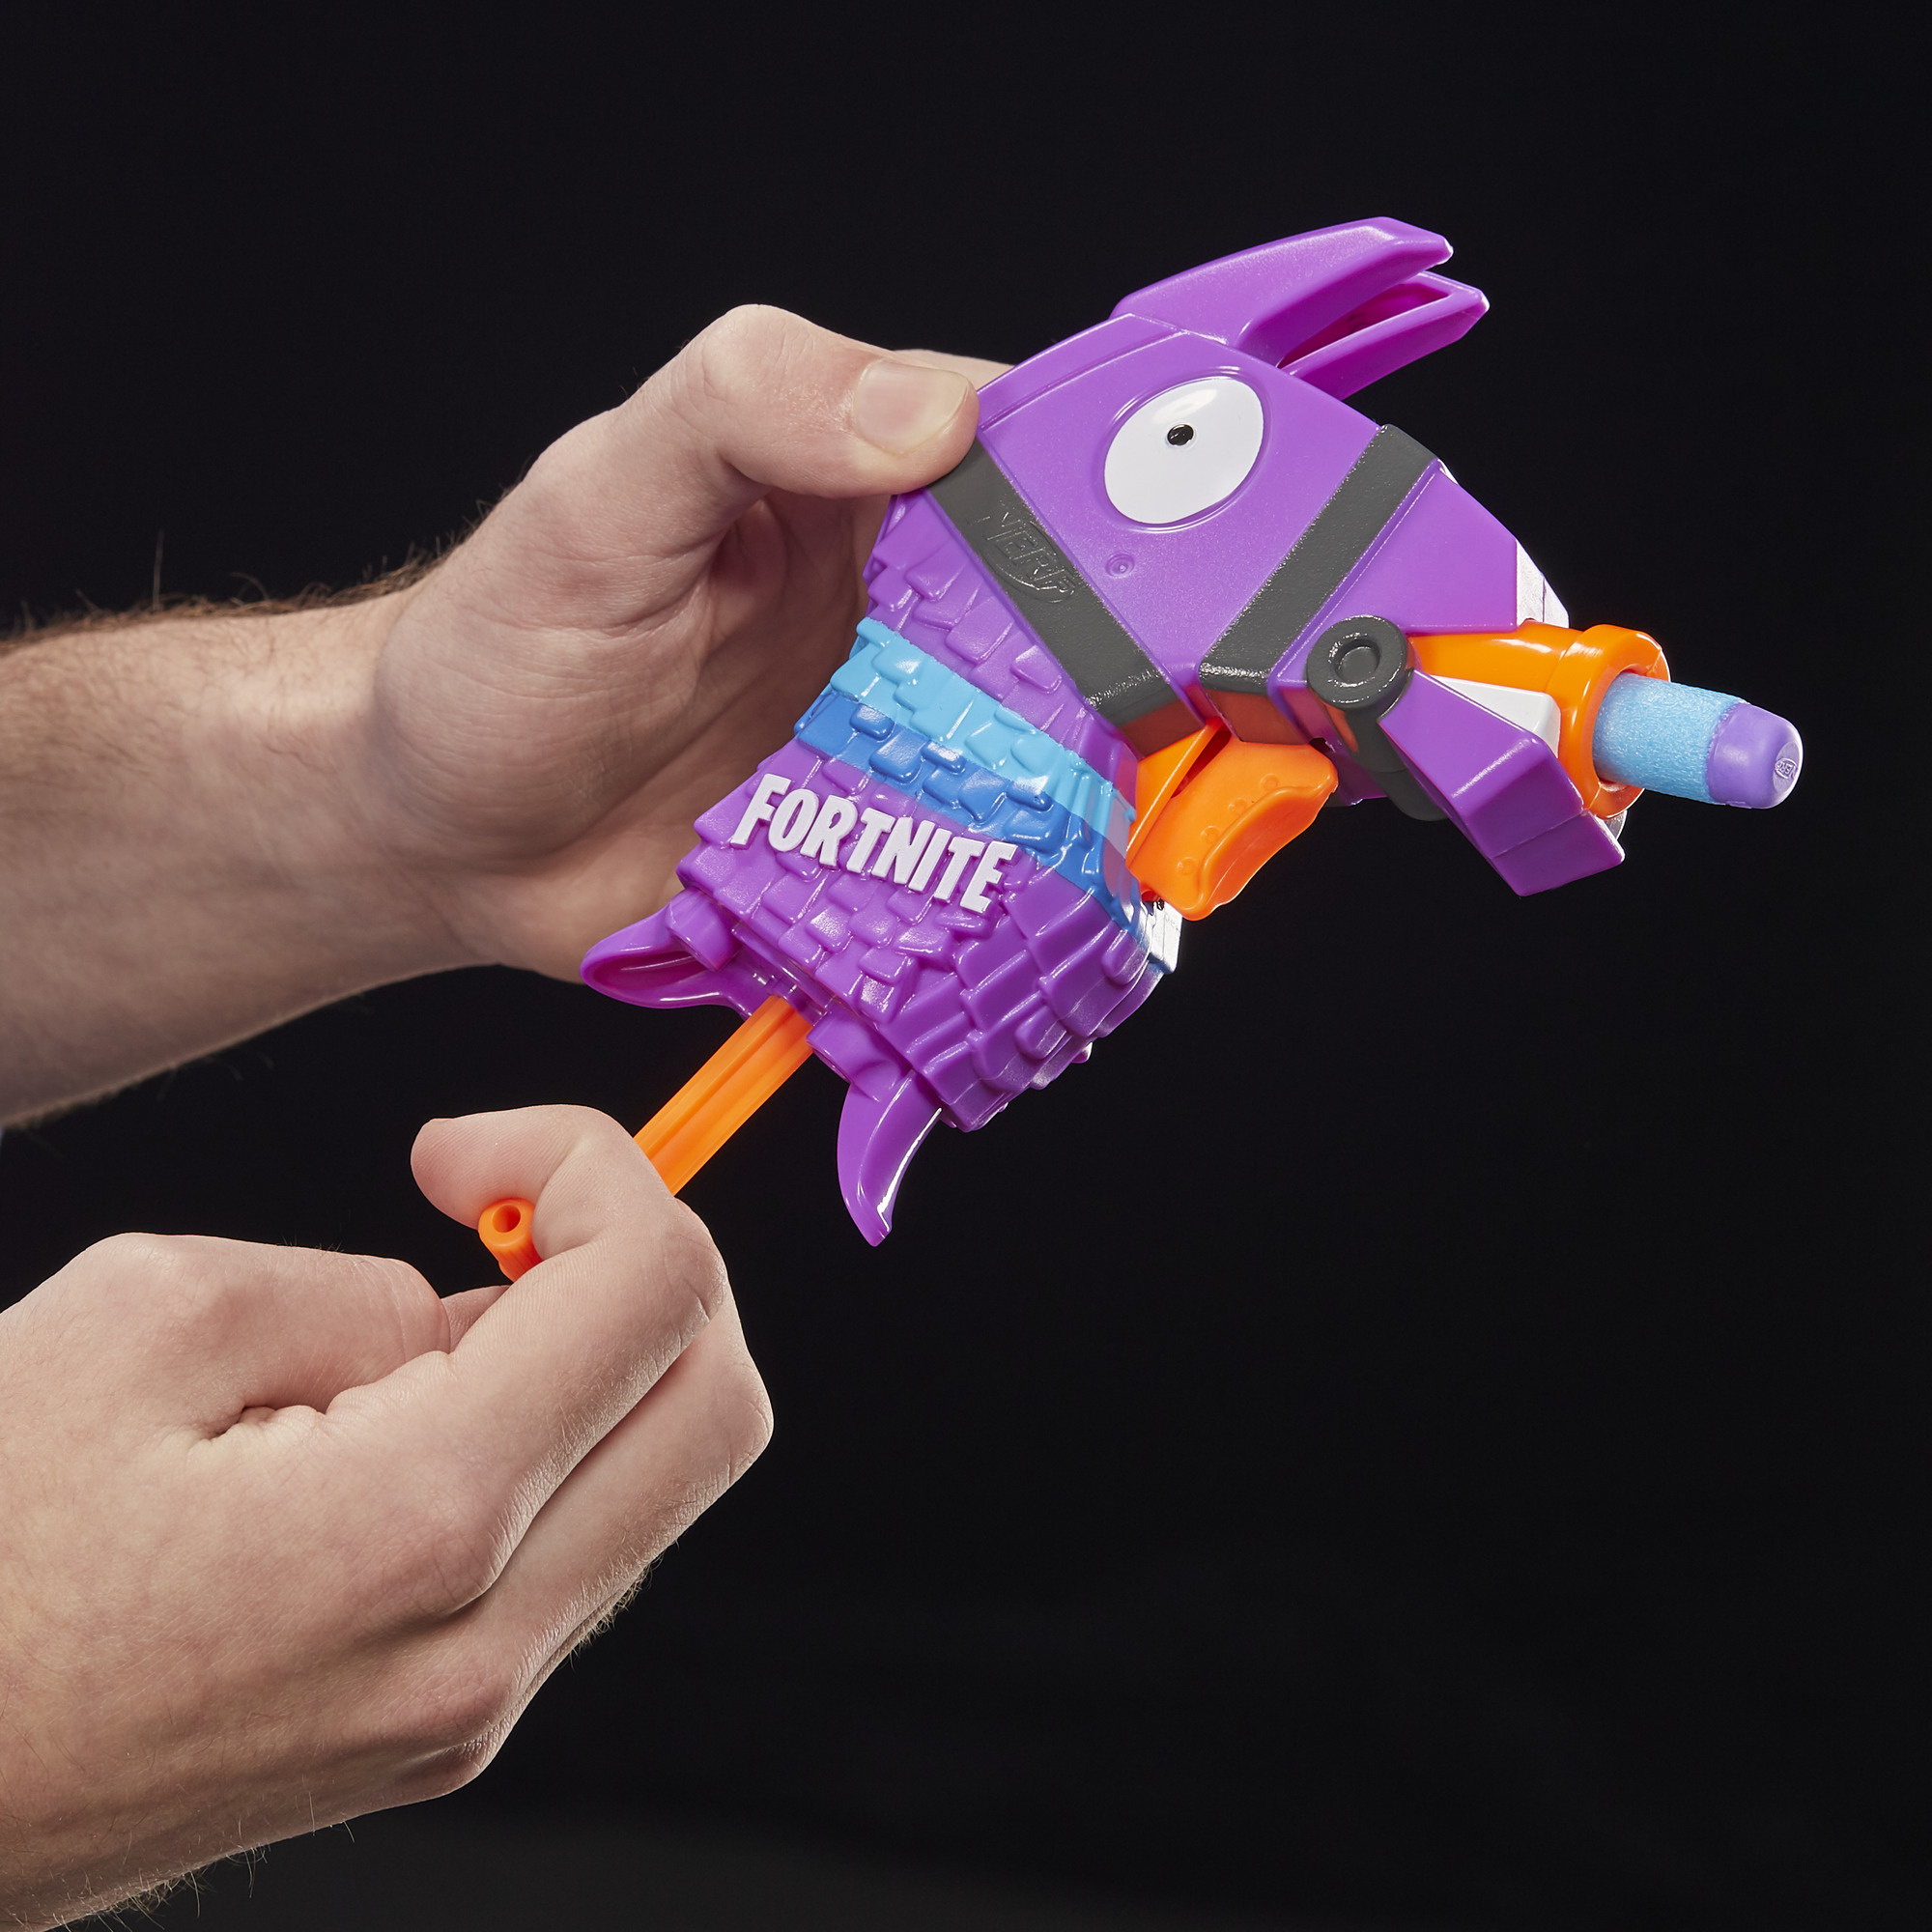 FORTNITE Nerf Micro Shots *MICRO LLAMA* Dart-Firing Toy Blaster 2 Darts 2019 New